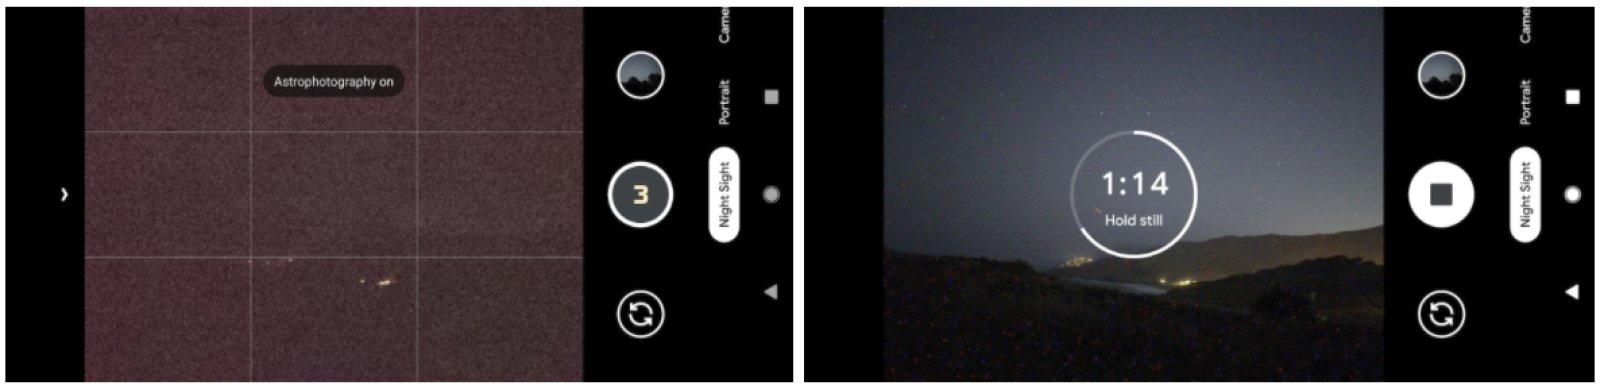 Pixel 4 Astrophotography Mode